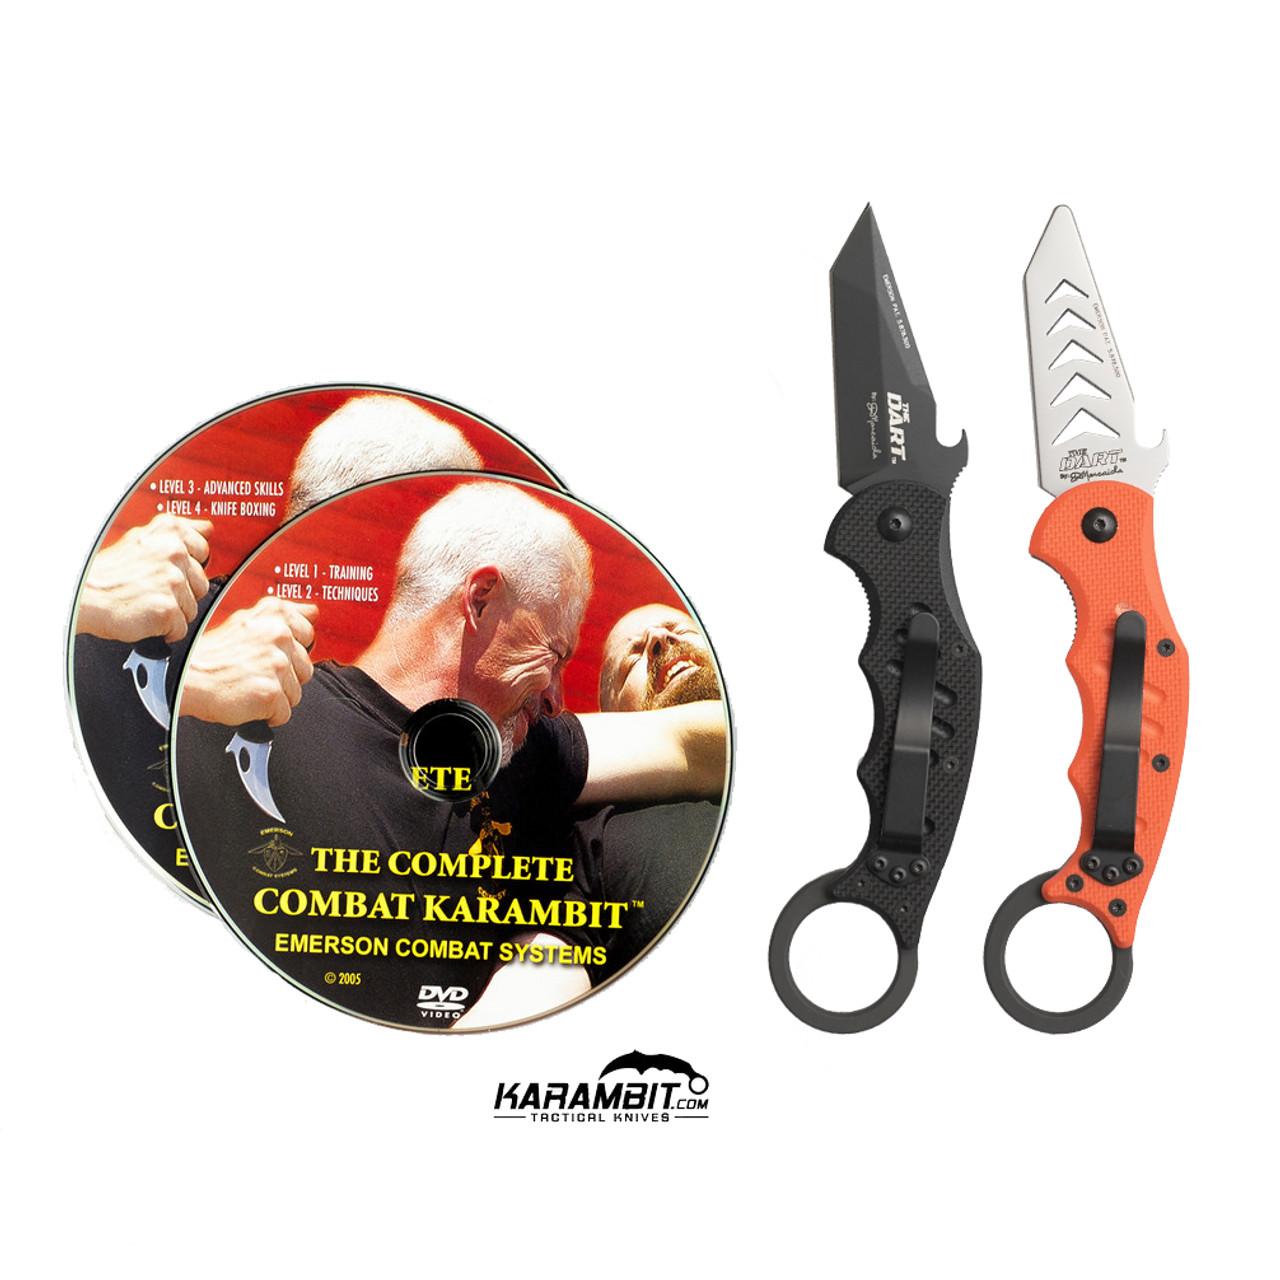 Fox 597 Dart Karambit + Trainer + DVD - 3 in 1 Package